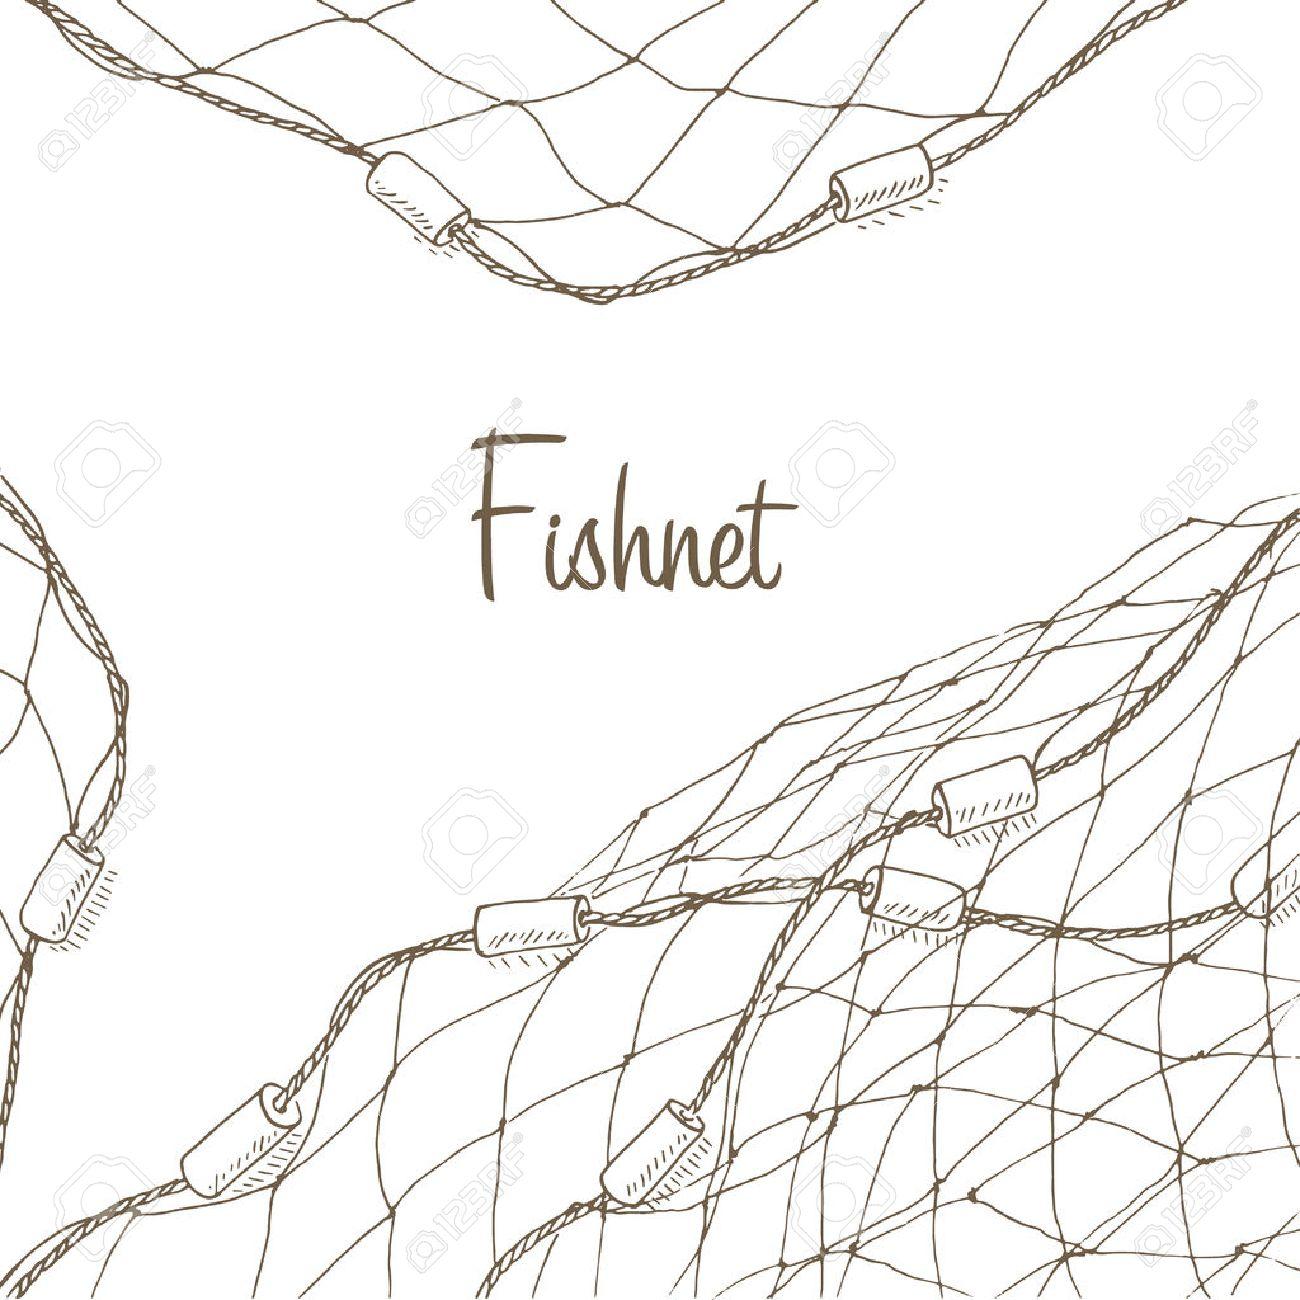 Fishing net background. Fish net flyer. Fishnet template. Fishing net hand drawn vector illustrations. Fish net card. Fishery frame with net. Net for fishing frame - 52163236